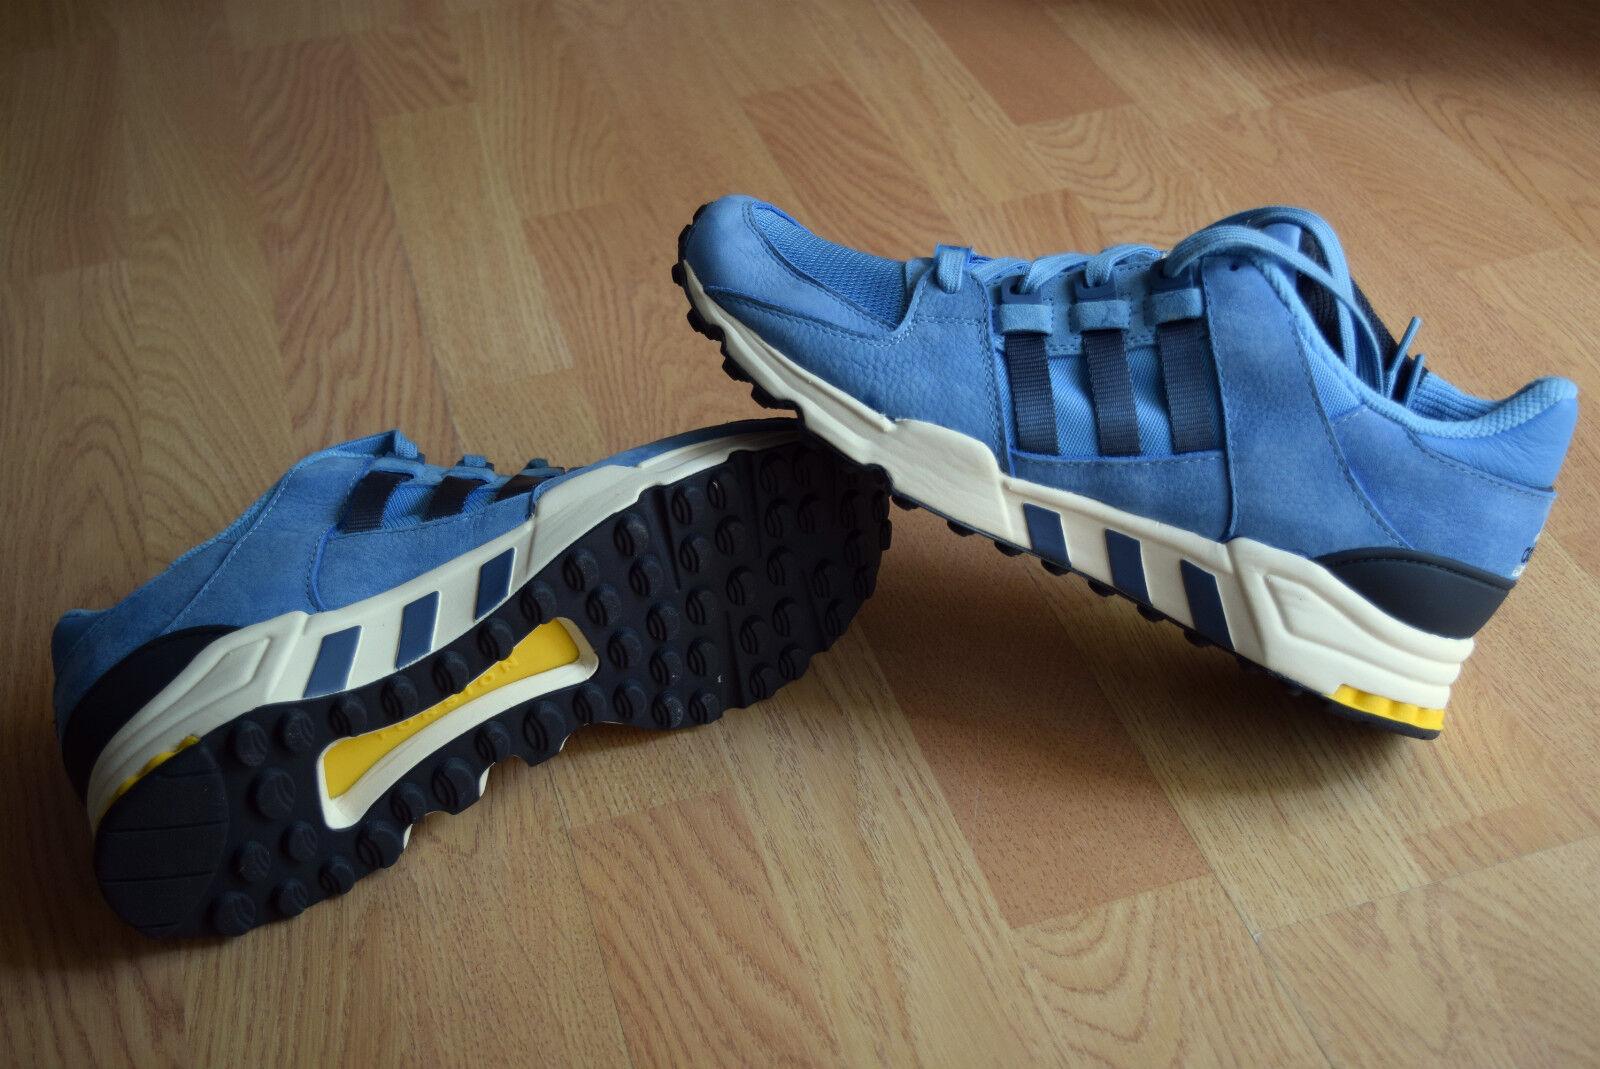 Adidas Equipment Support Running 45 46 46 46  B24777 cOnSorTium guidance ea0737